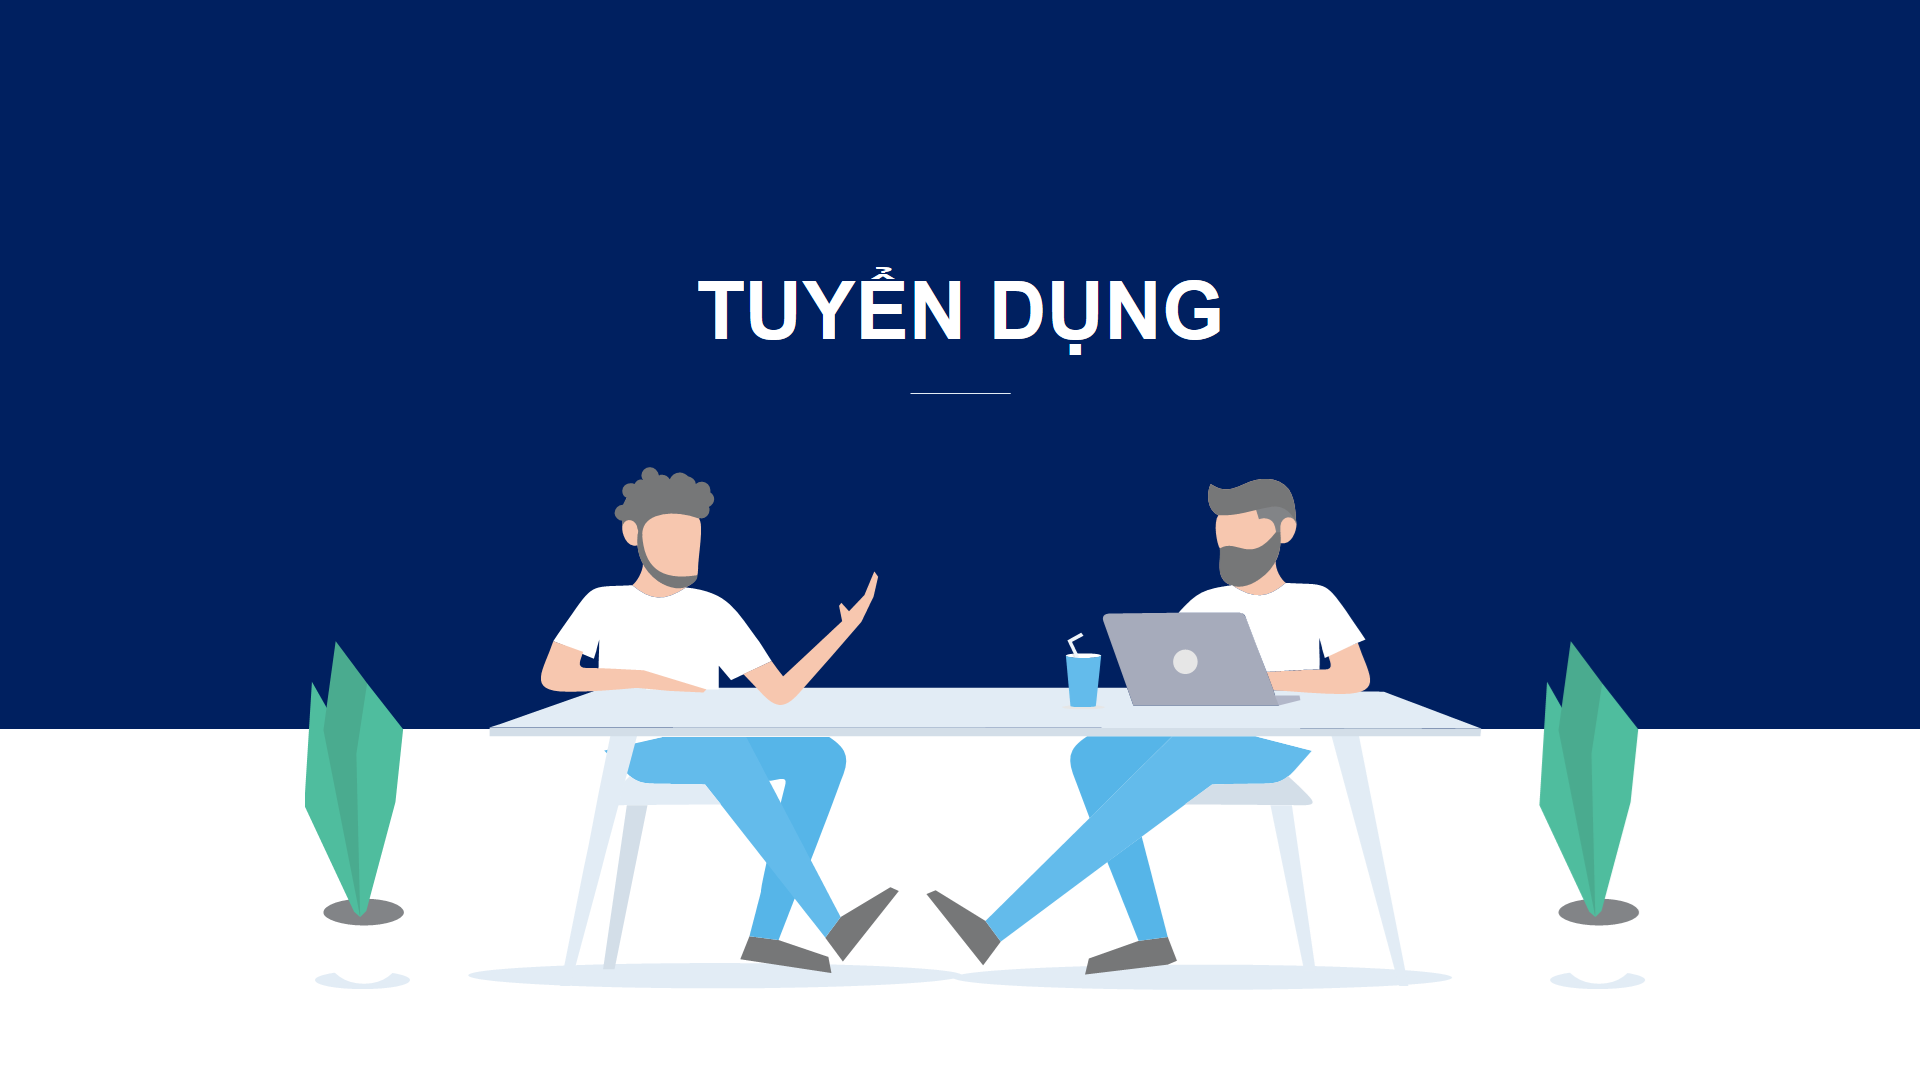 TUYEN-DUNG-1